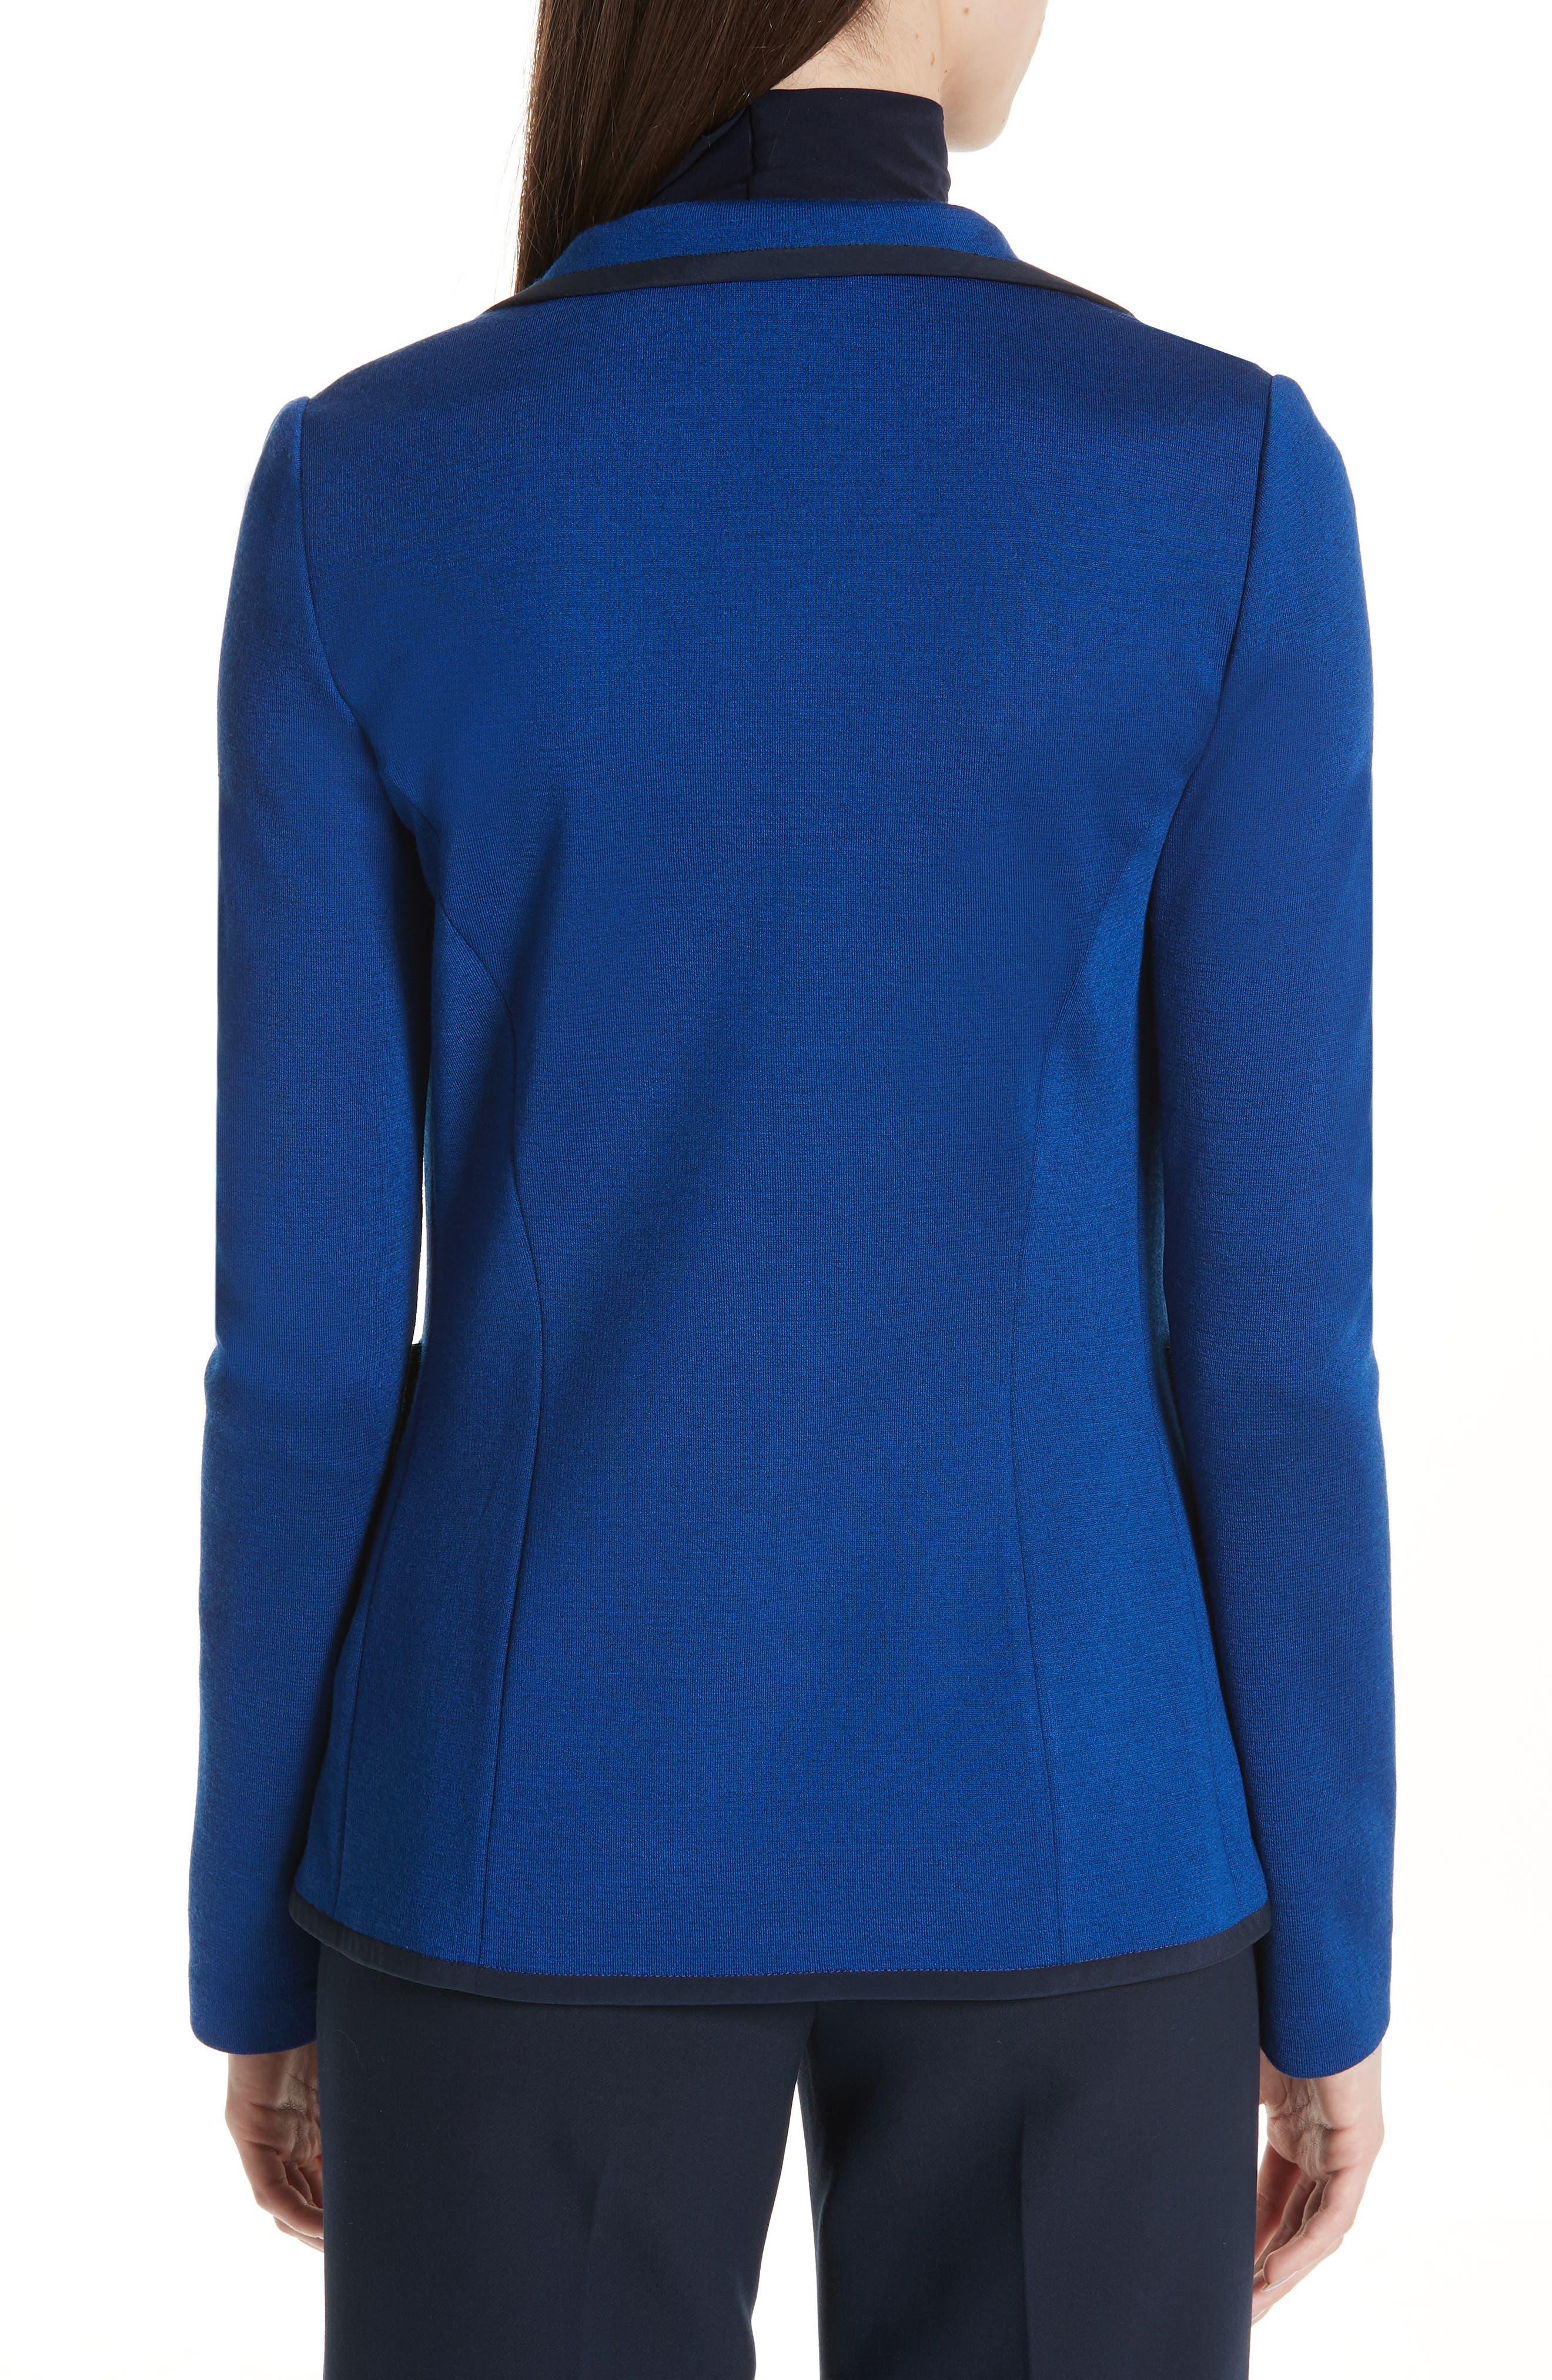 ST. JOHN COLLECTION, Patch Pocket Milano Knit Jacket, Alternate thumbnail 2, color, AZUL/ NAVY